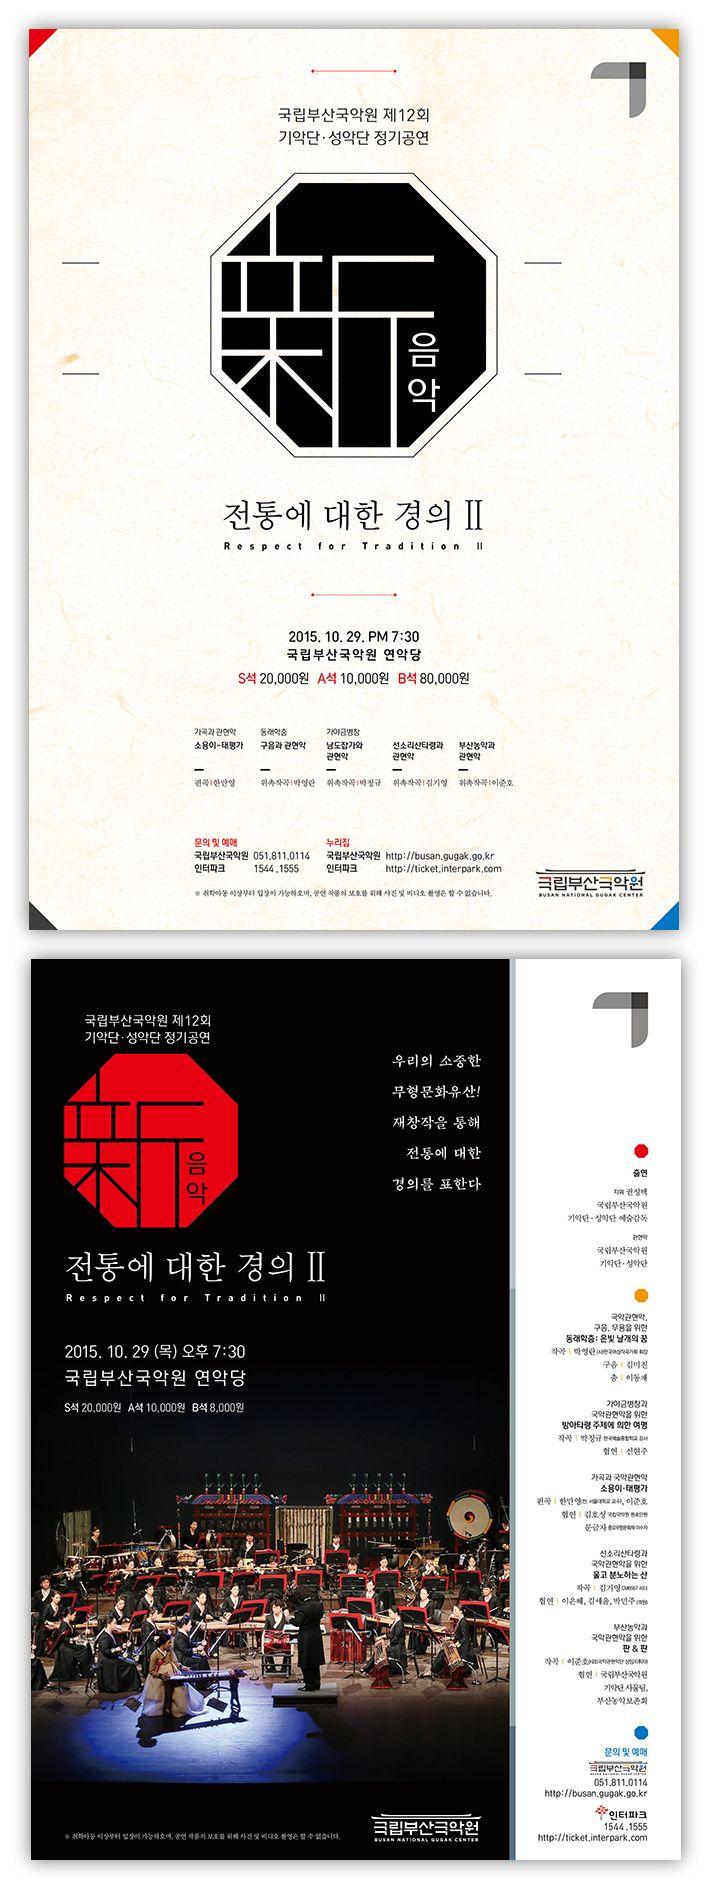 [poster] 정기공연 포스터 [디자인 : 디자인 노트] KMUG